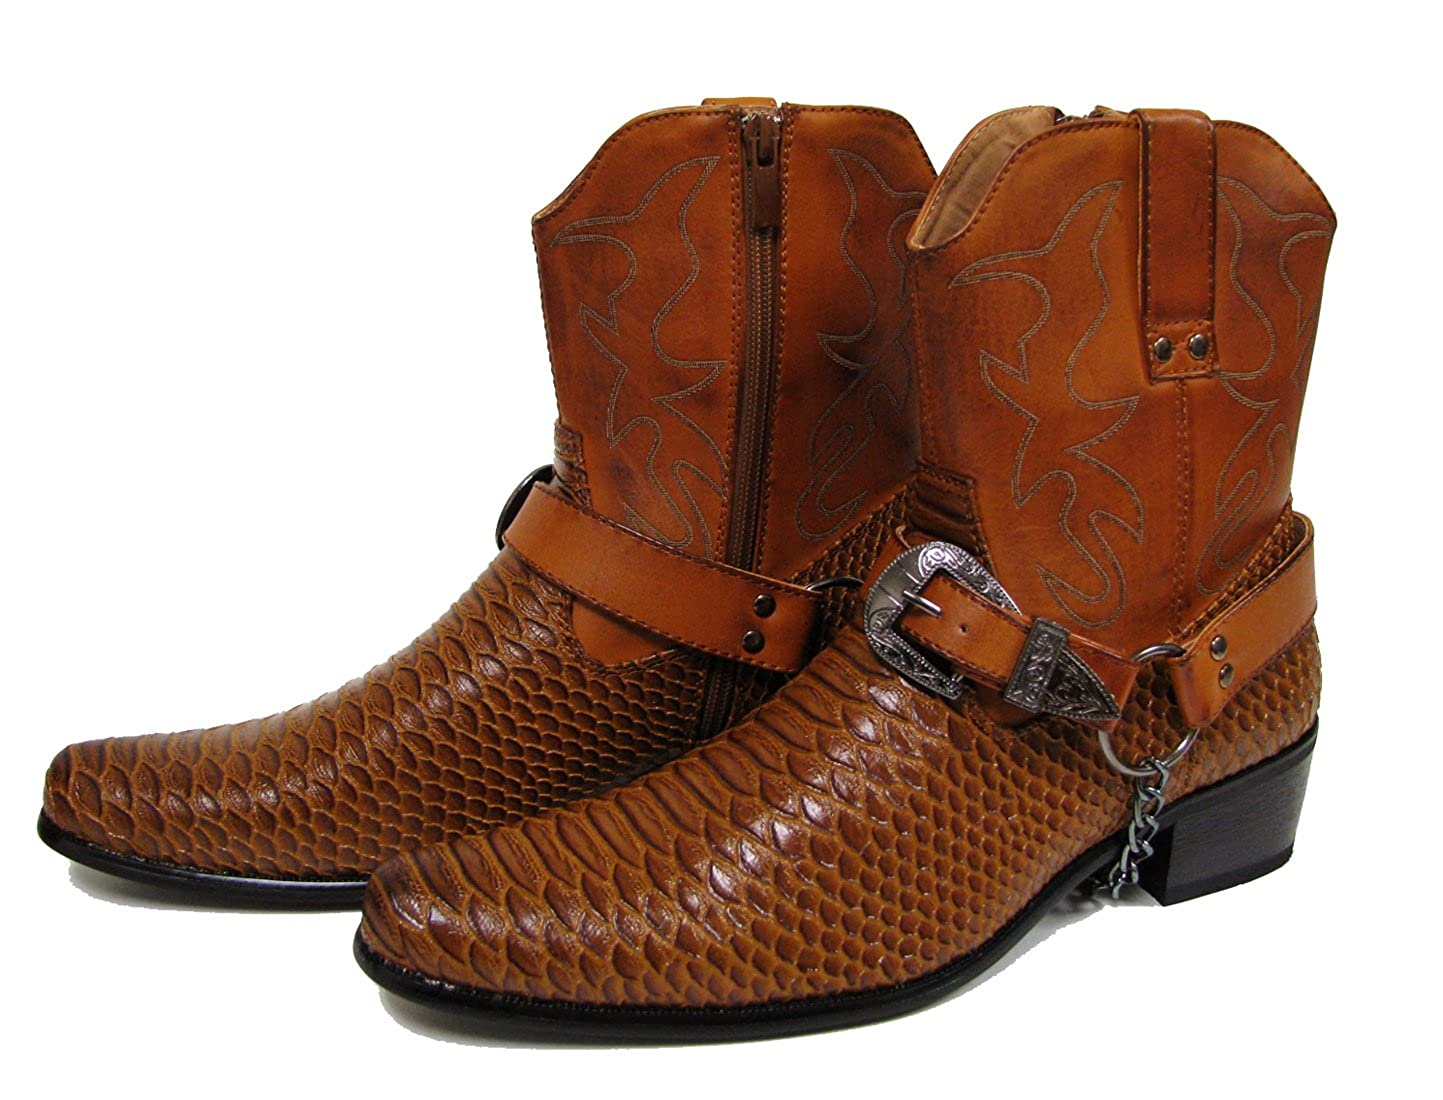 J-jap Men/'s Cowboy Boots Western Alligator Snake Skin Print Crocodile Zippper Buckle Harness Chain Ankle Shoes